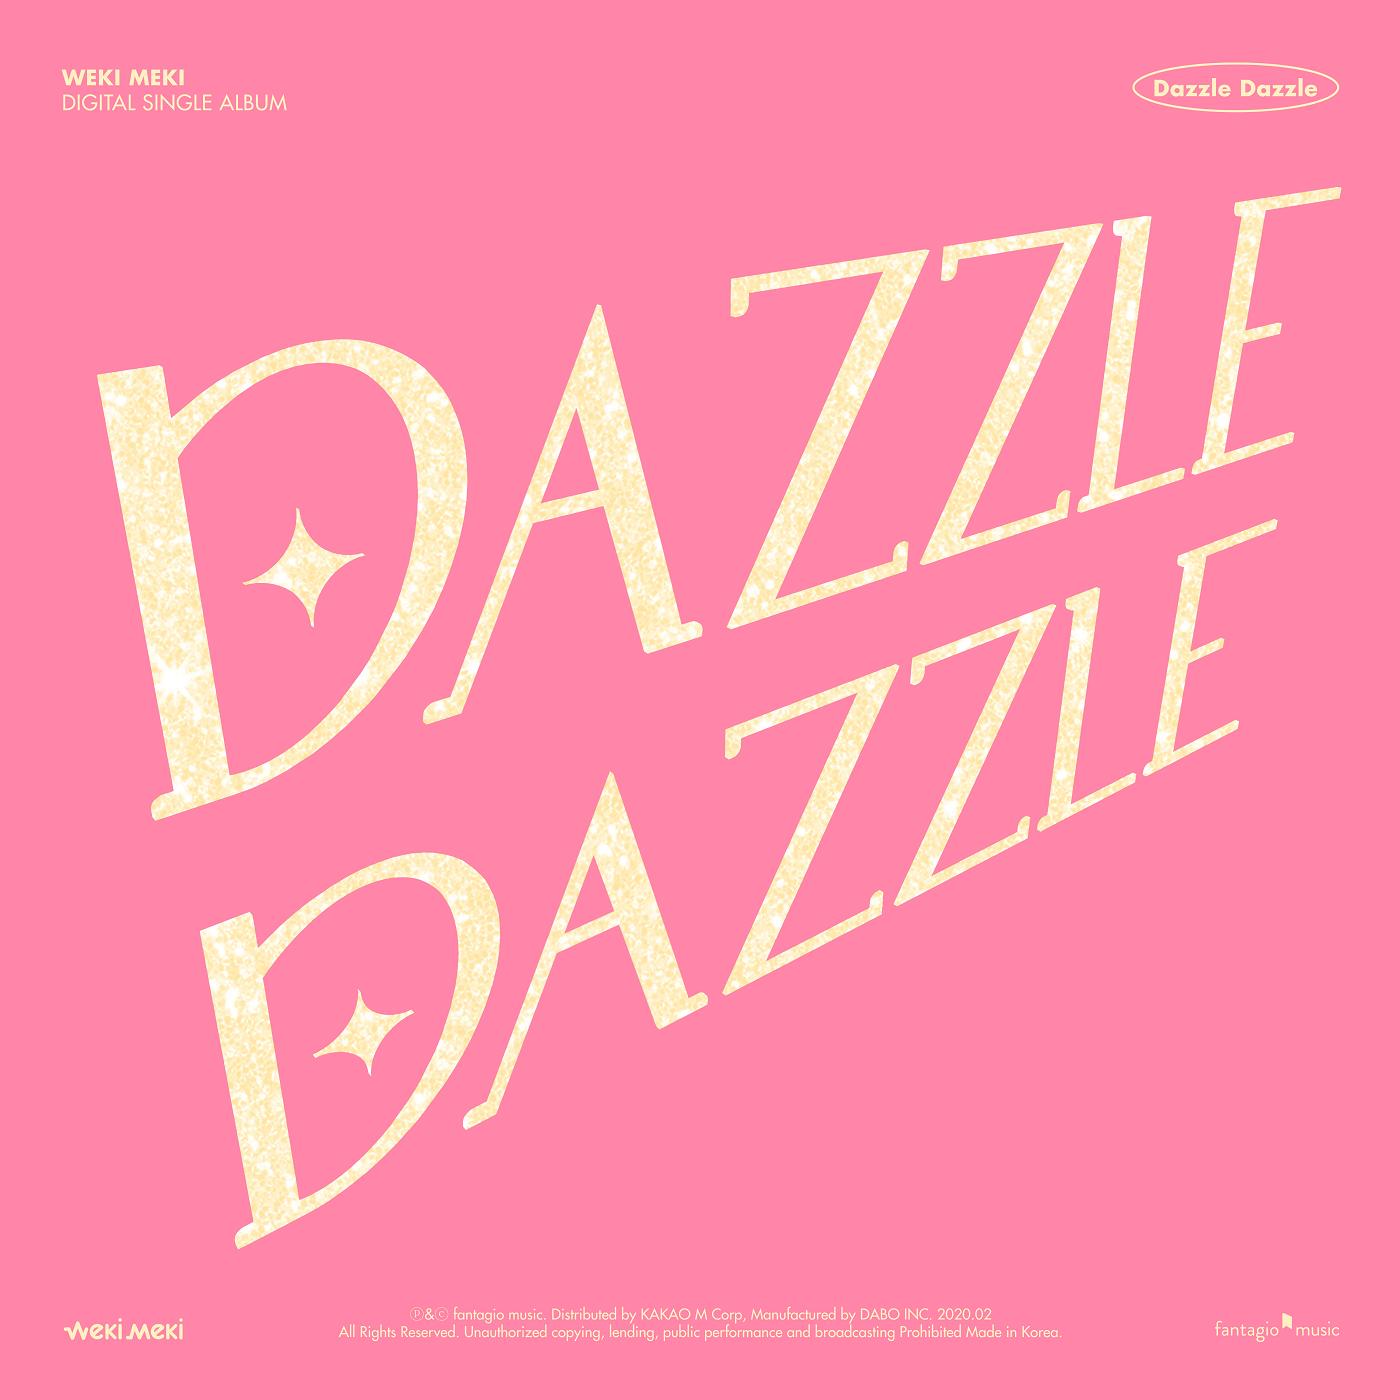 Dazzle Dazzle